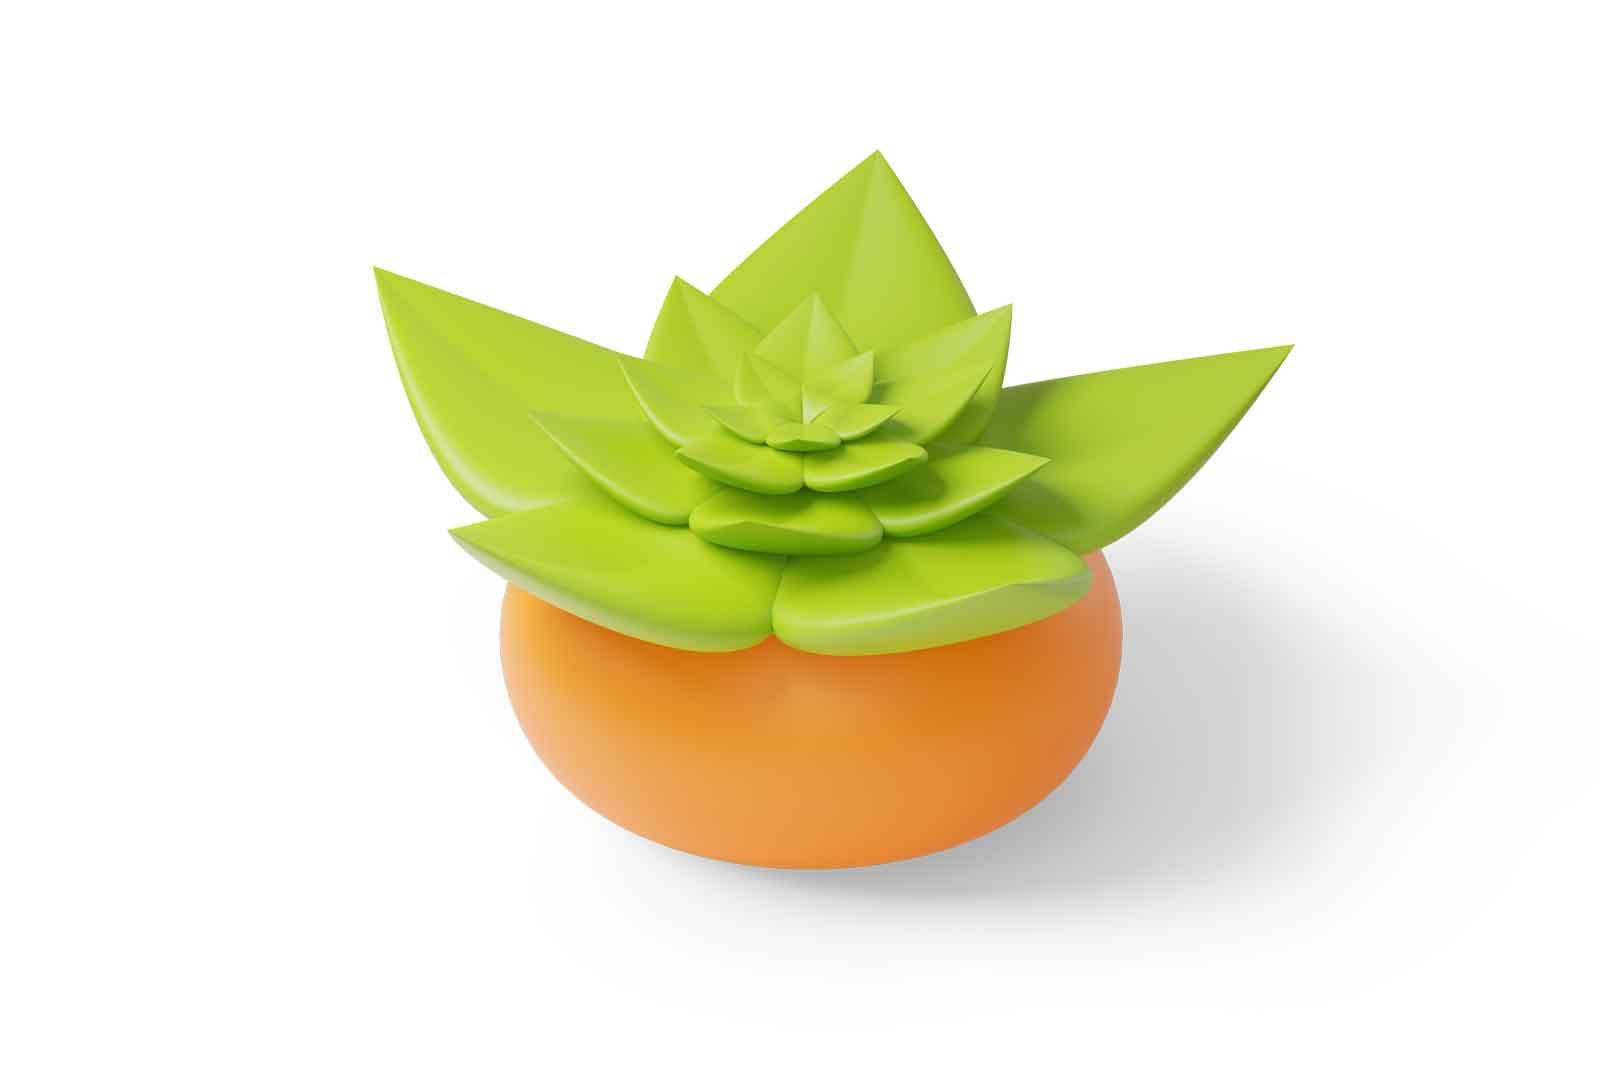 Orange flowerpot for decorating the interiors of apartments 3d illustration. Isometric green decorative houseplant in pot. Element for interior design